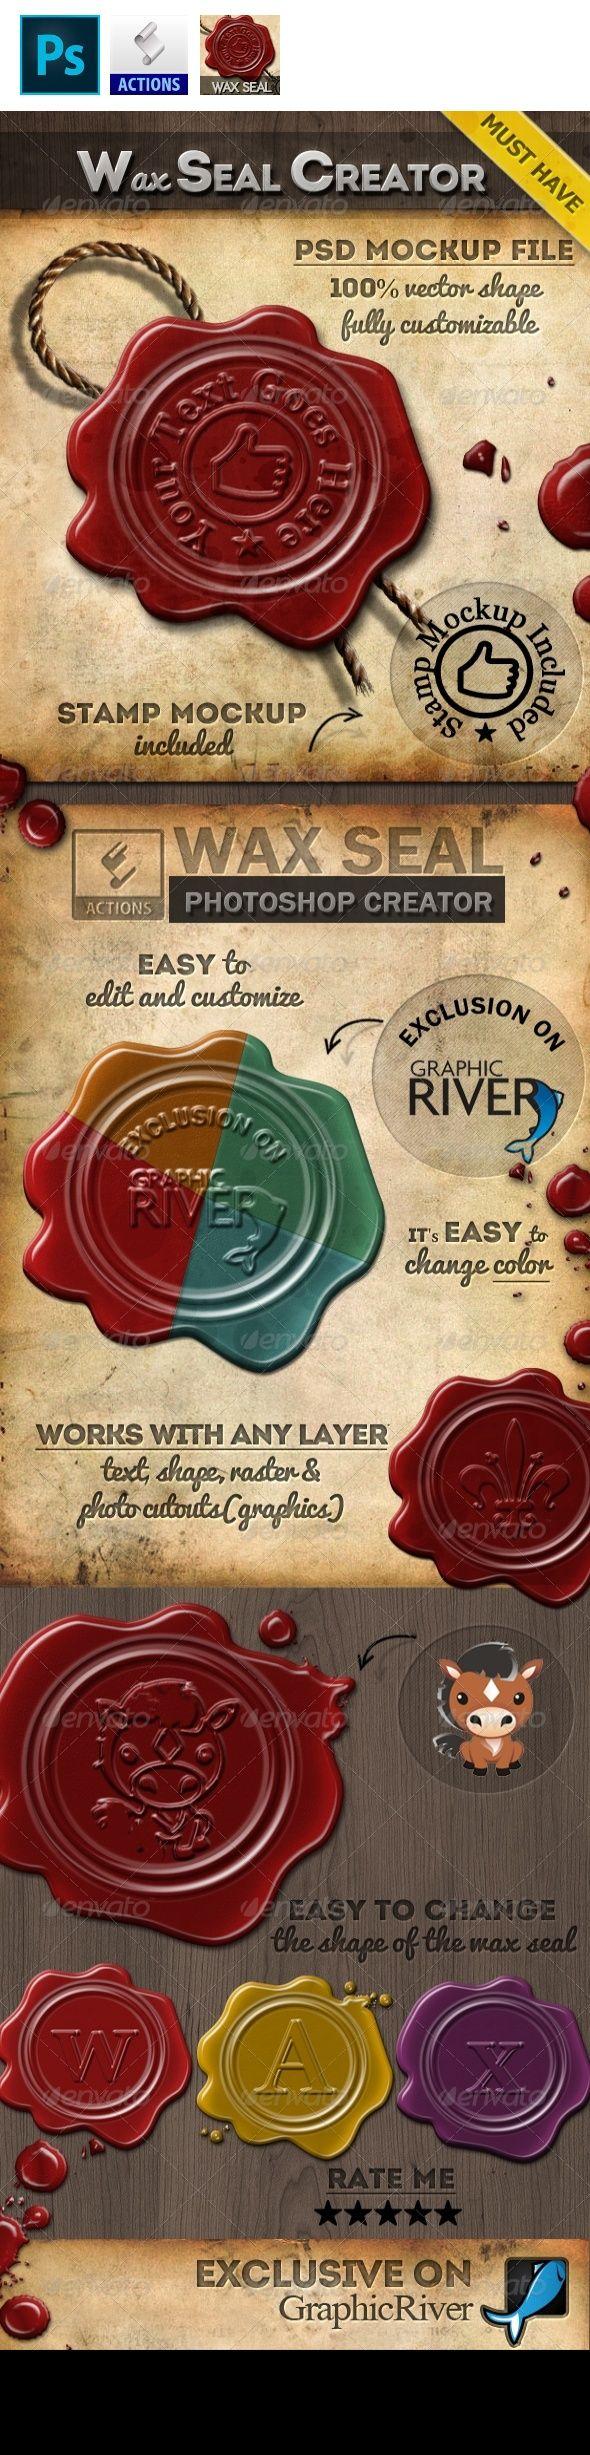 590x2455 Envelope Seal, Letter Seal, Seal Stamp, Seal Stamp Creator, Seal